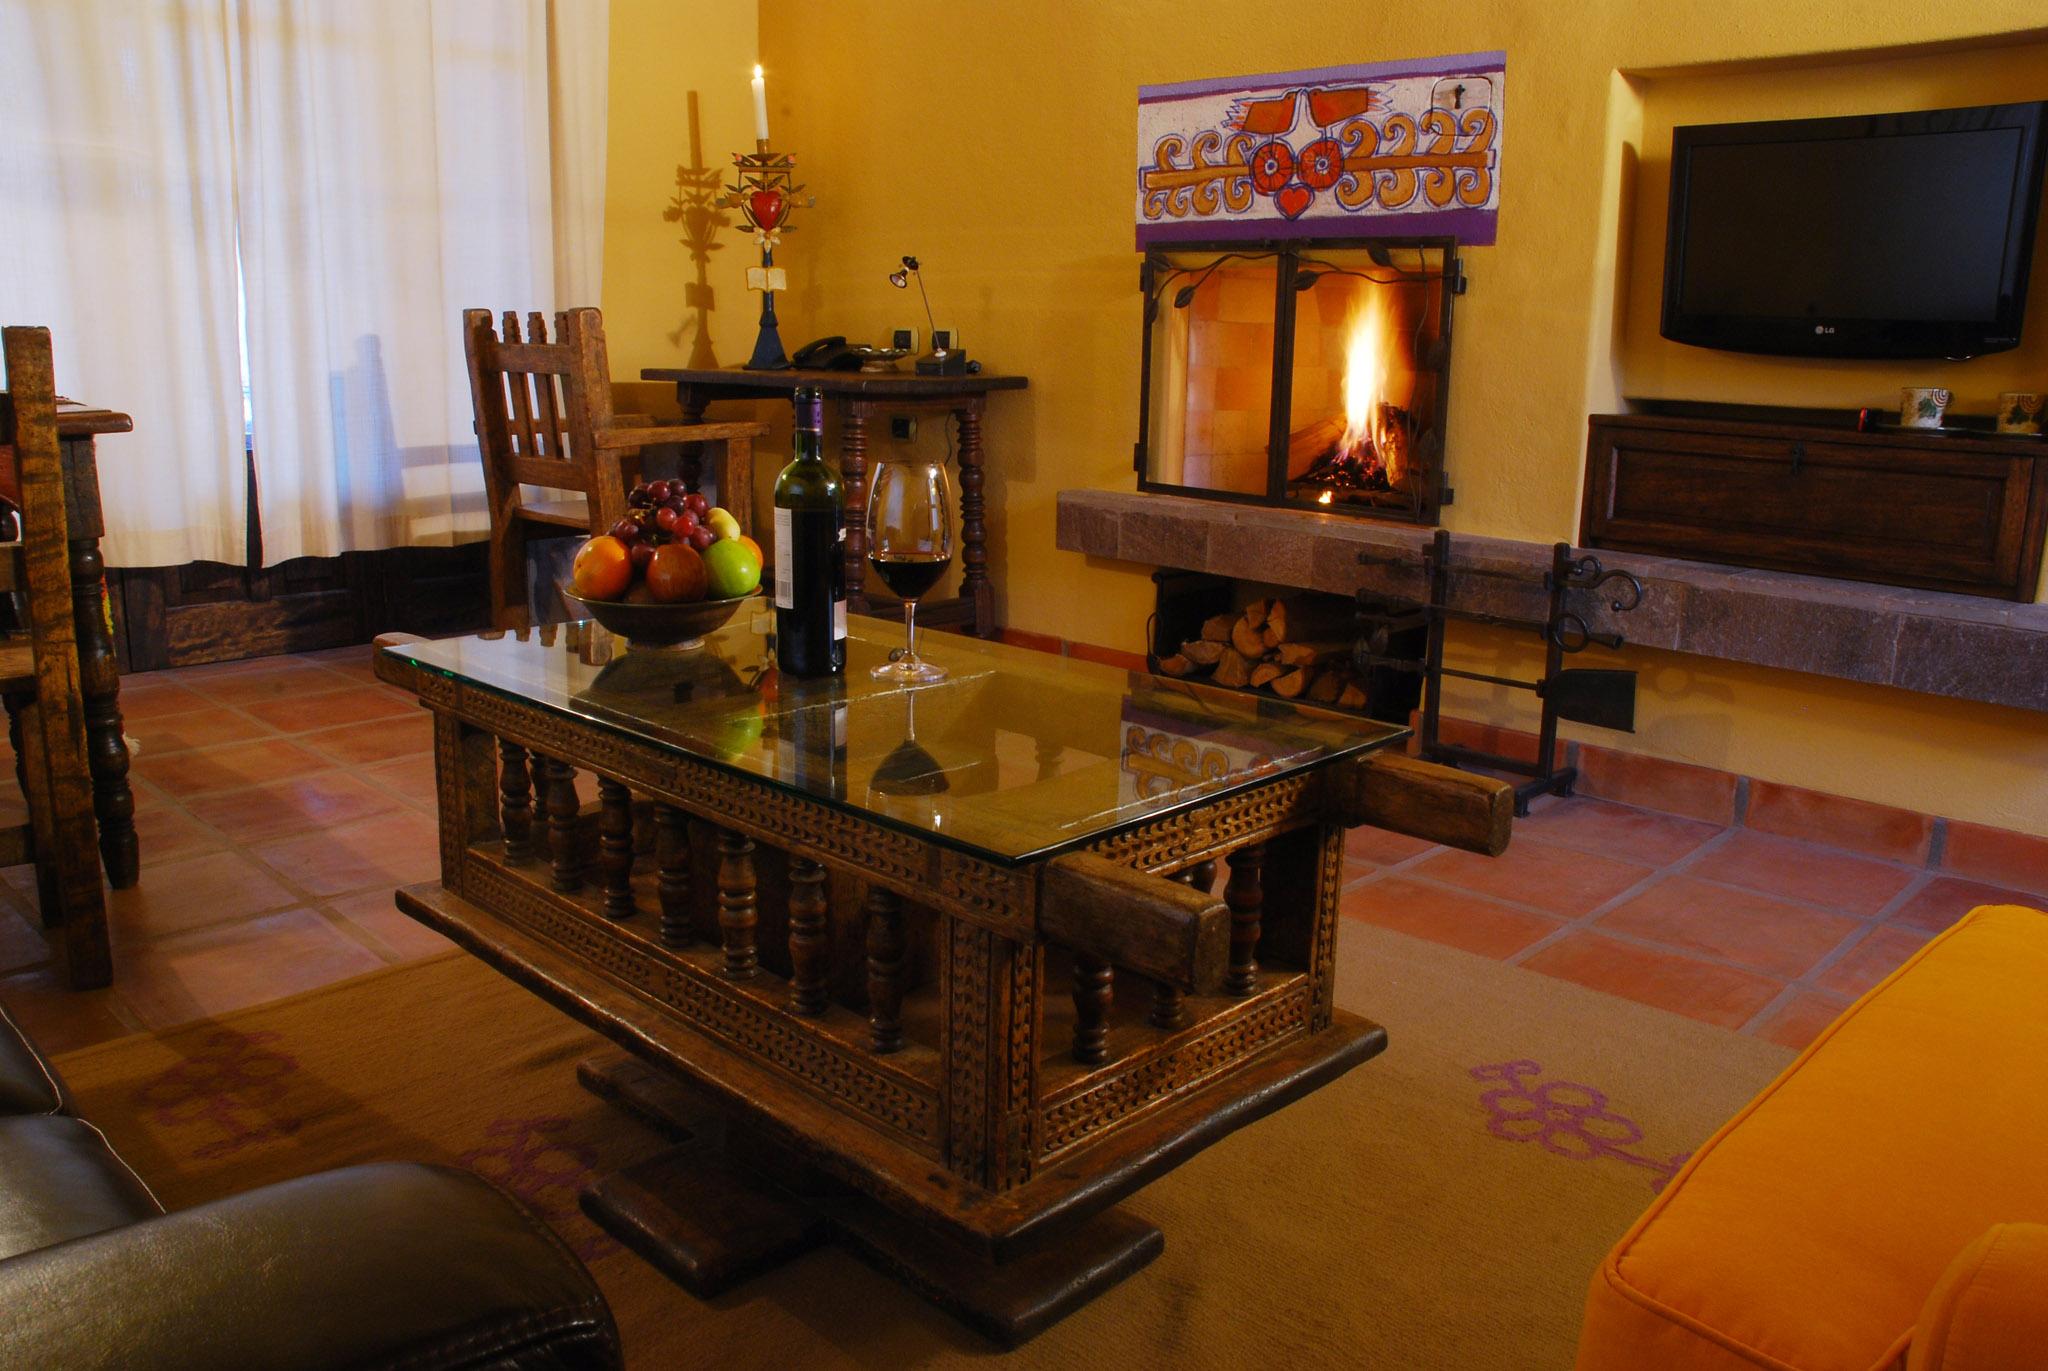 Peru hotels review – New Suites of the Sol y Luna, Aracari Travel